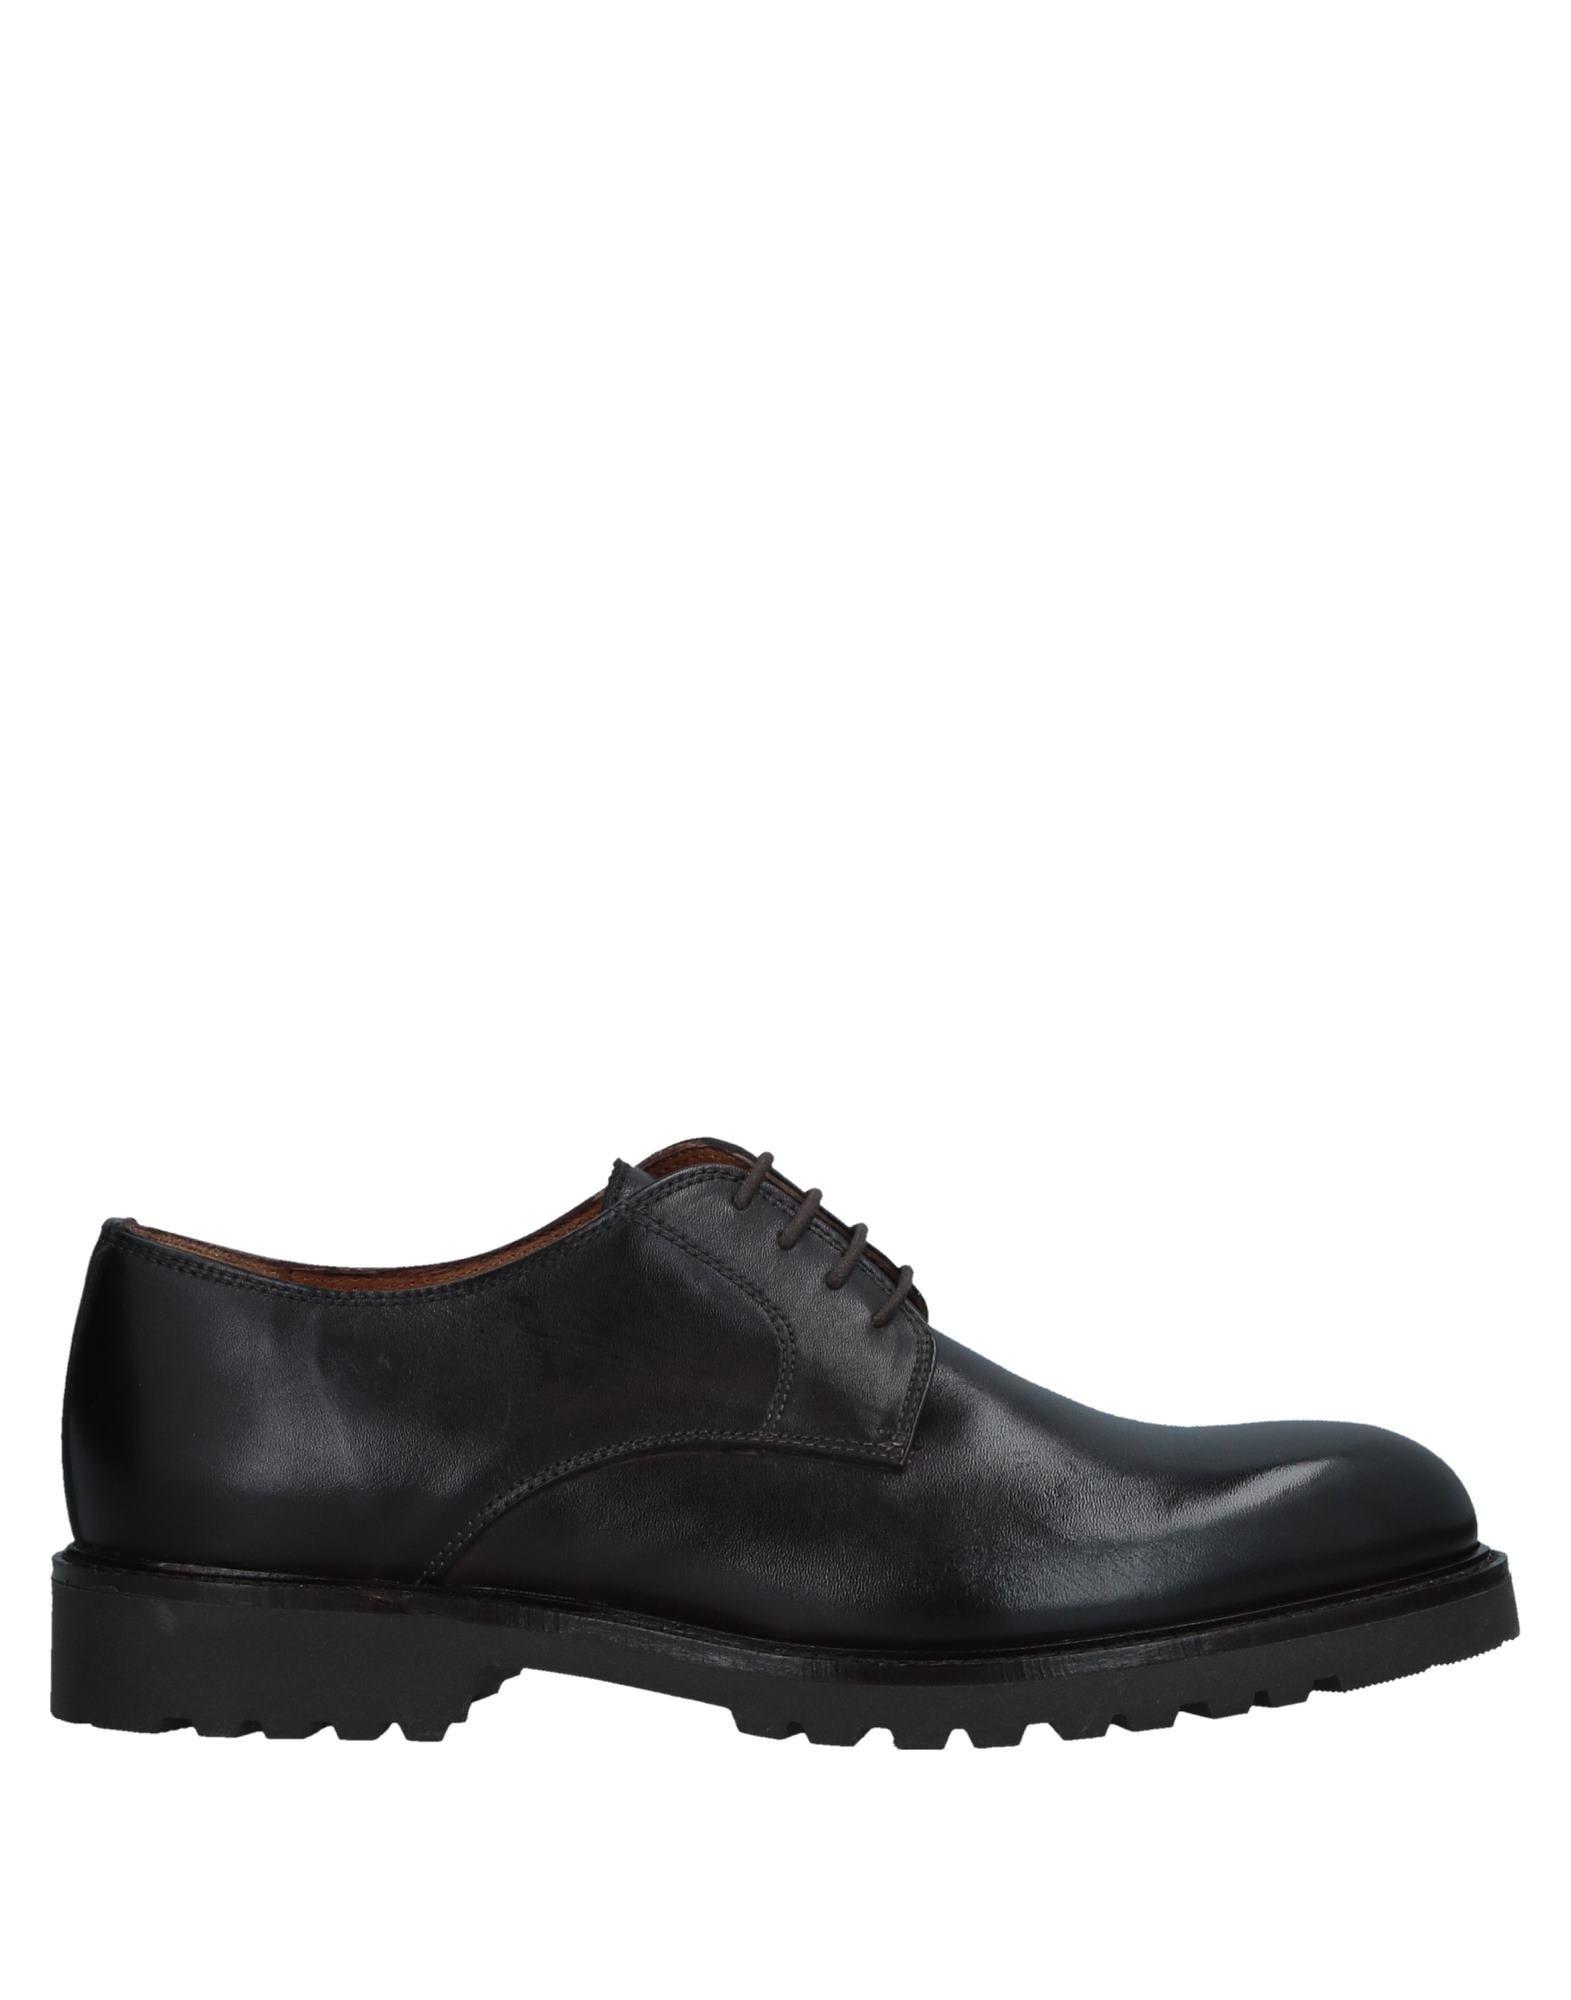 Rabatt echte Schuhe Brawn's Schnürschuhe Herren  11527105XM